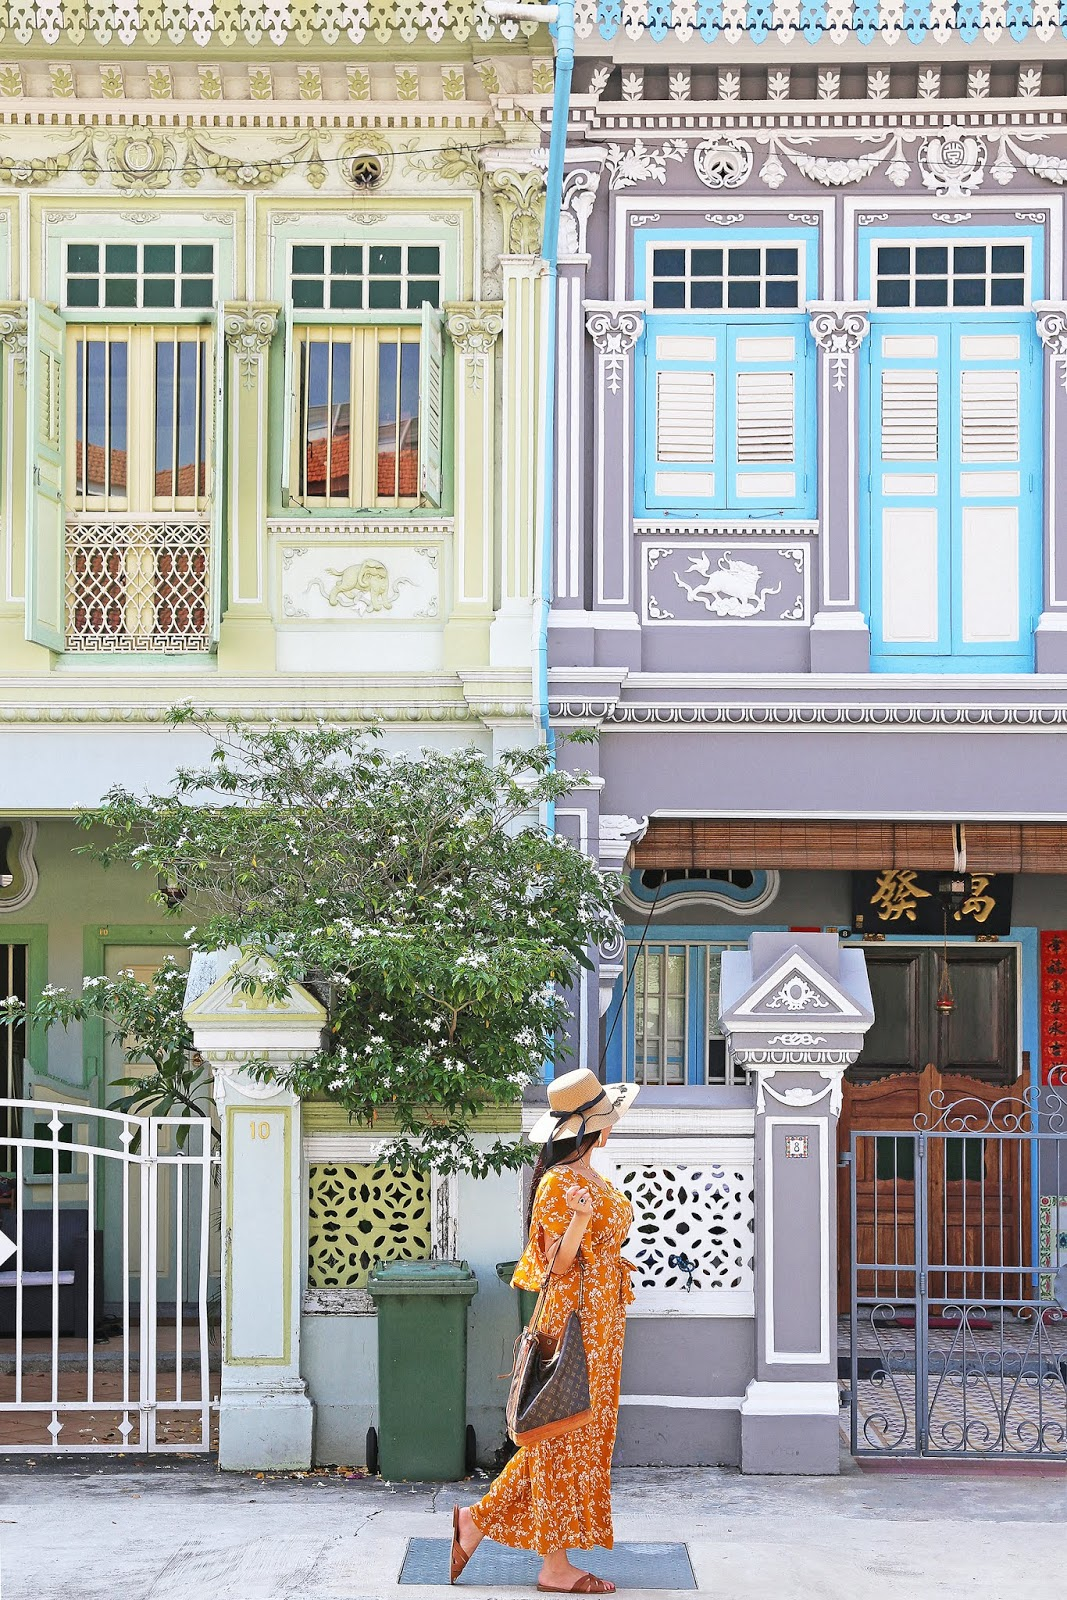 Singapore: My Identity, My Heritage, My Multi-National Upbringing, & More by Posh, Broke, & Bored